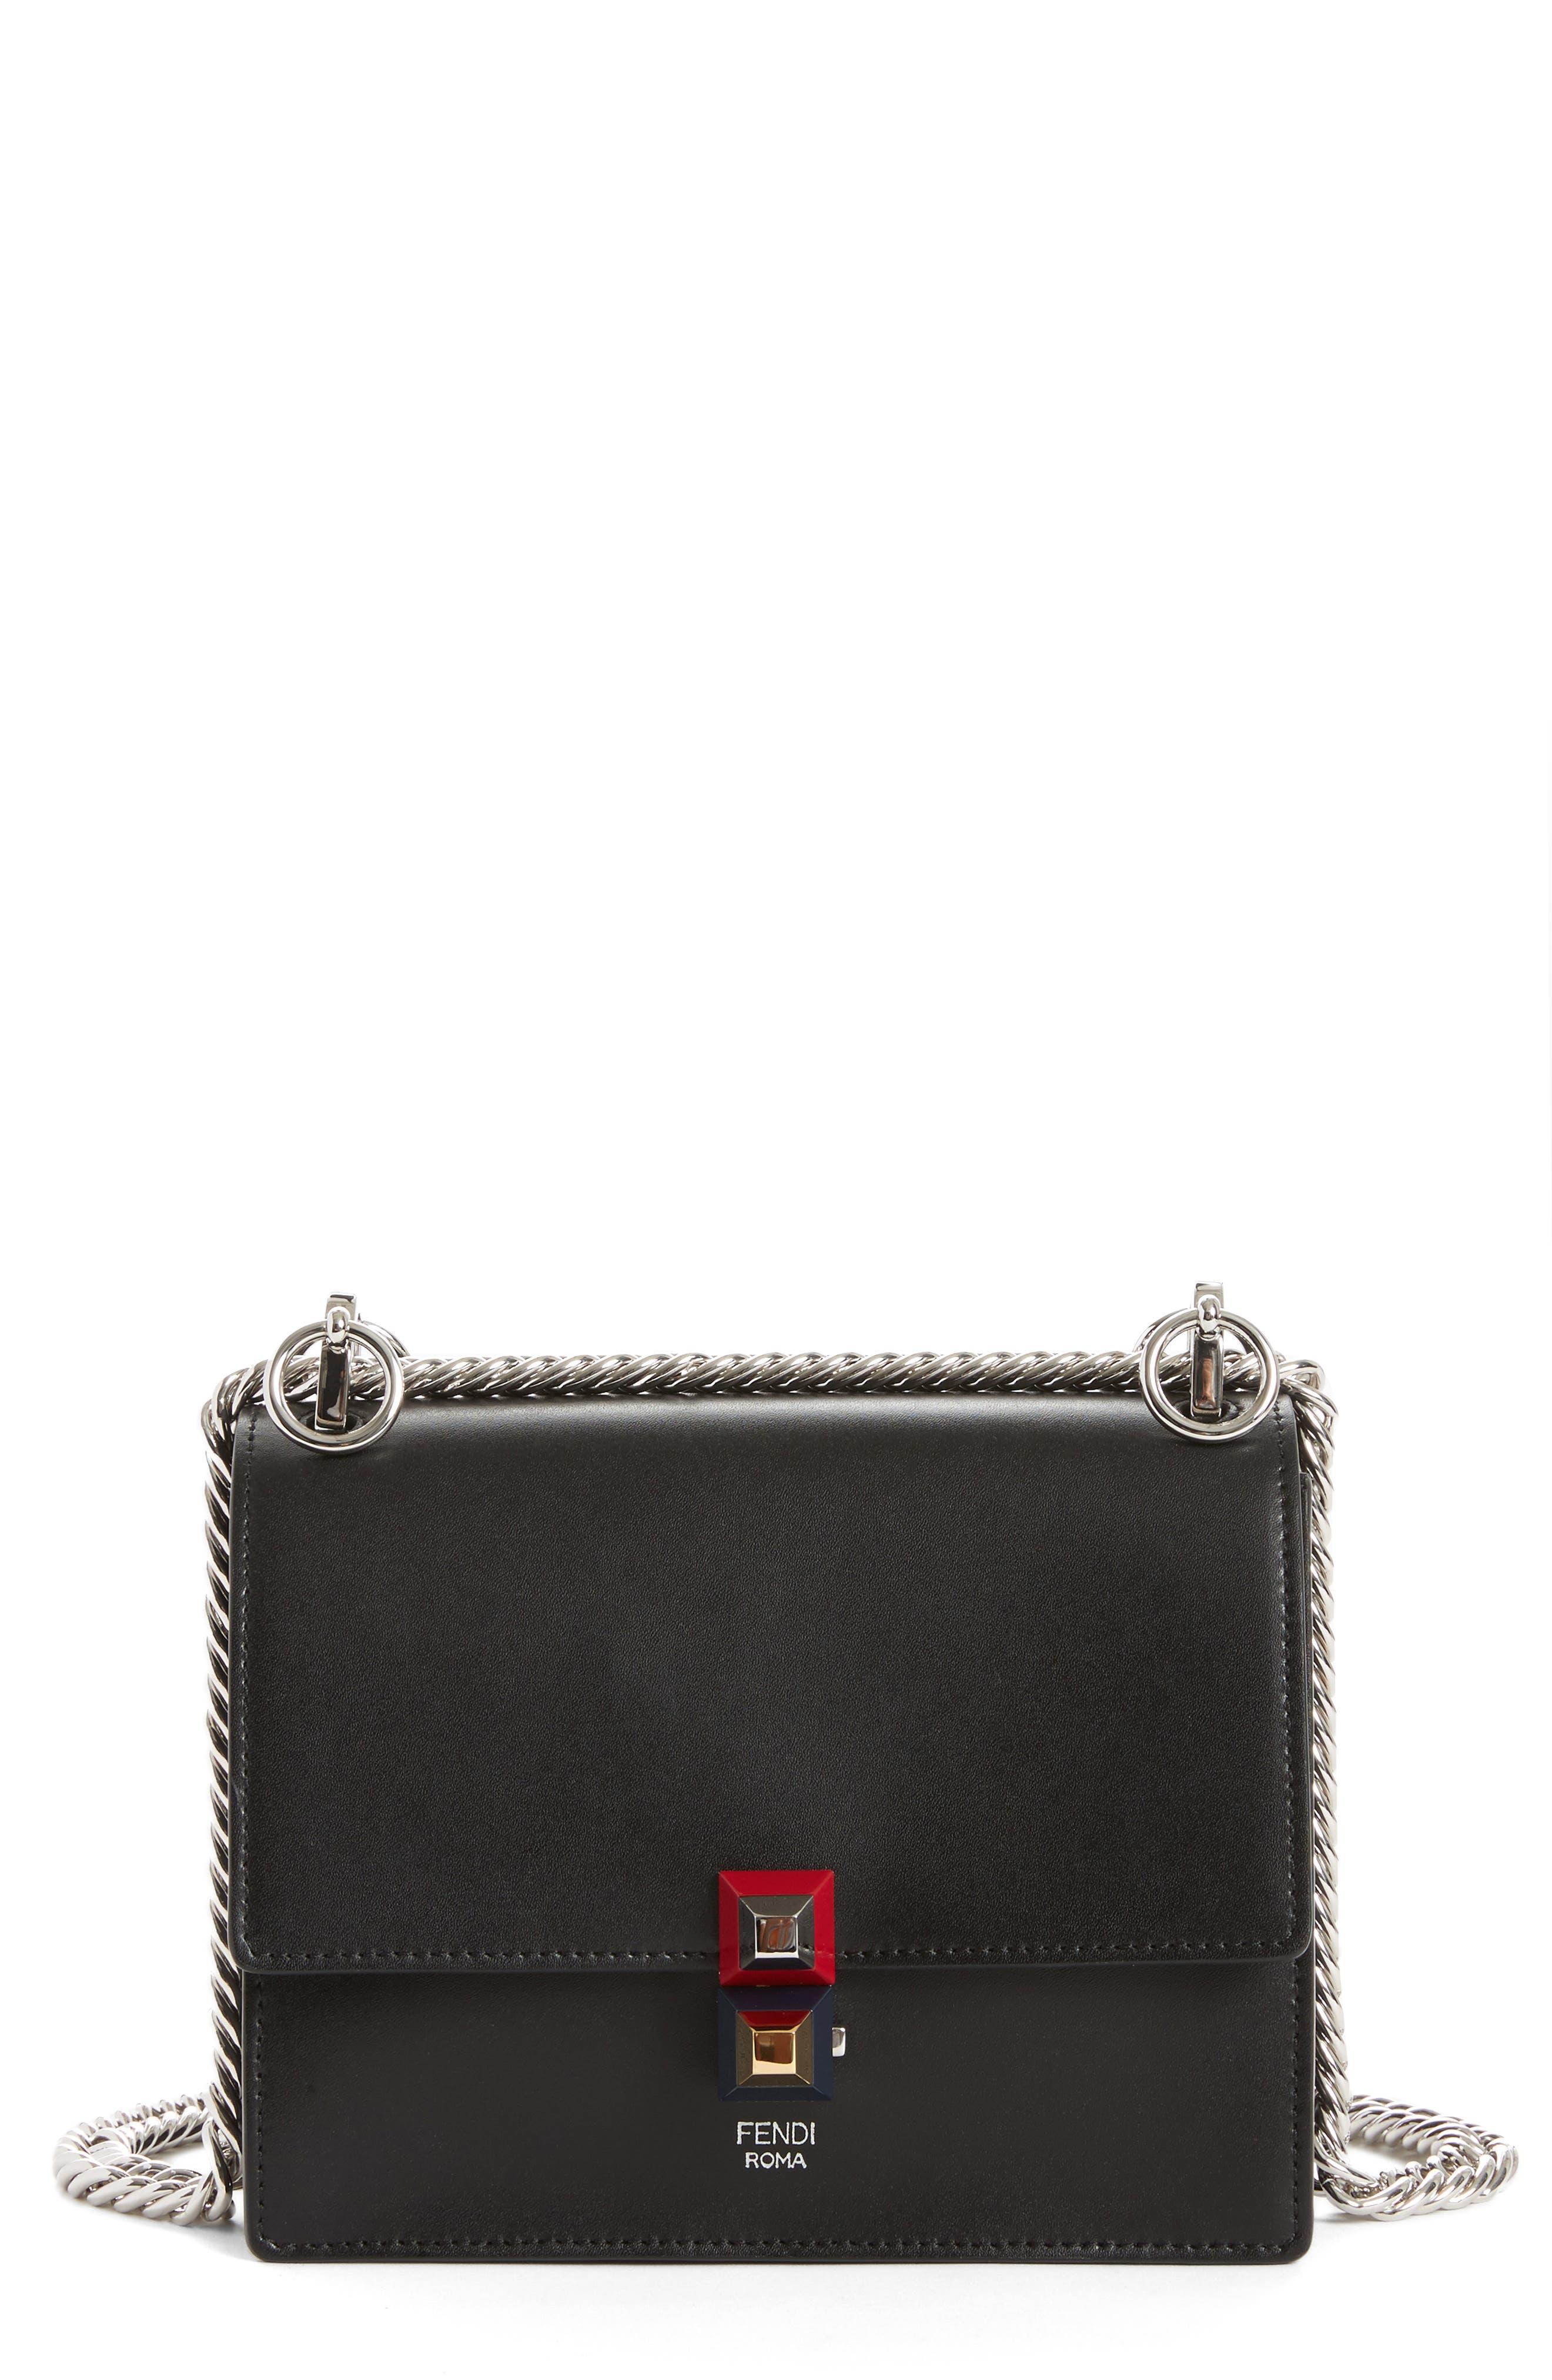 Small Kan I Leather Bag,                         Main,                         color, NERO